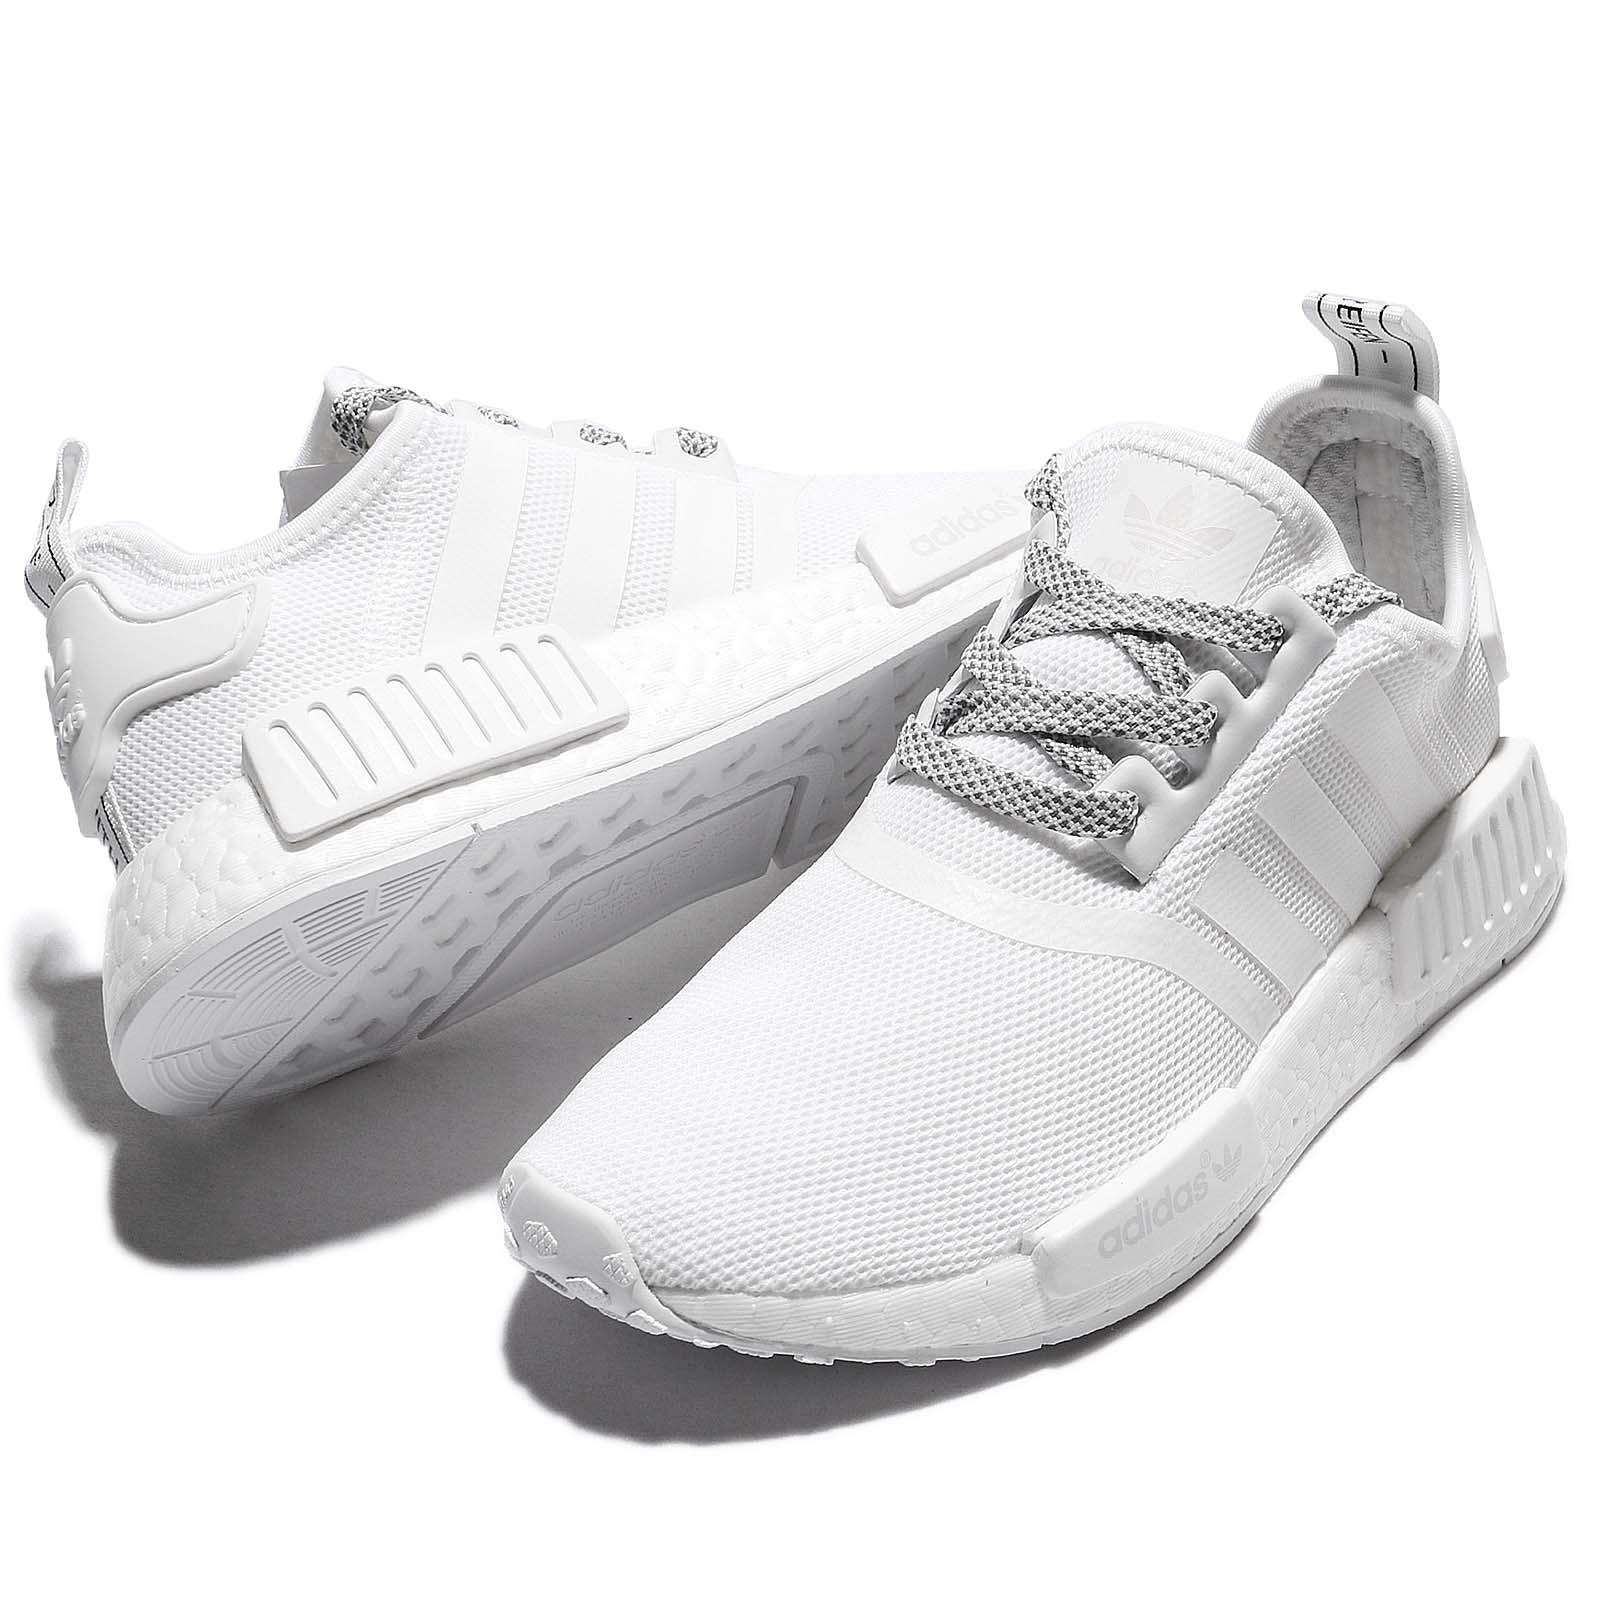 Adidas Shoes Nmd Amazon